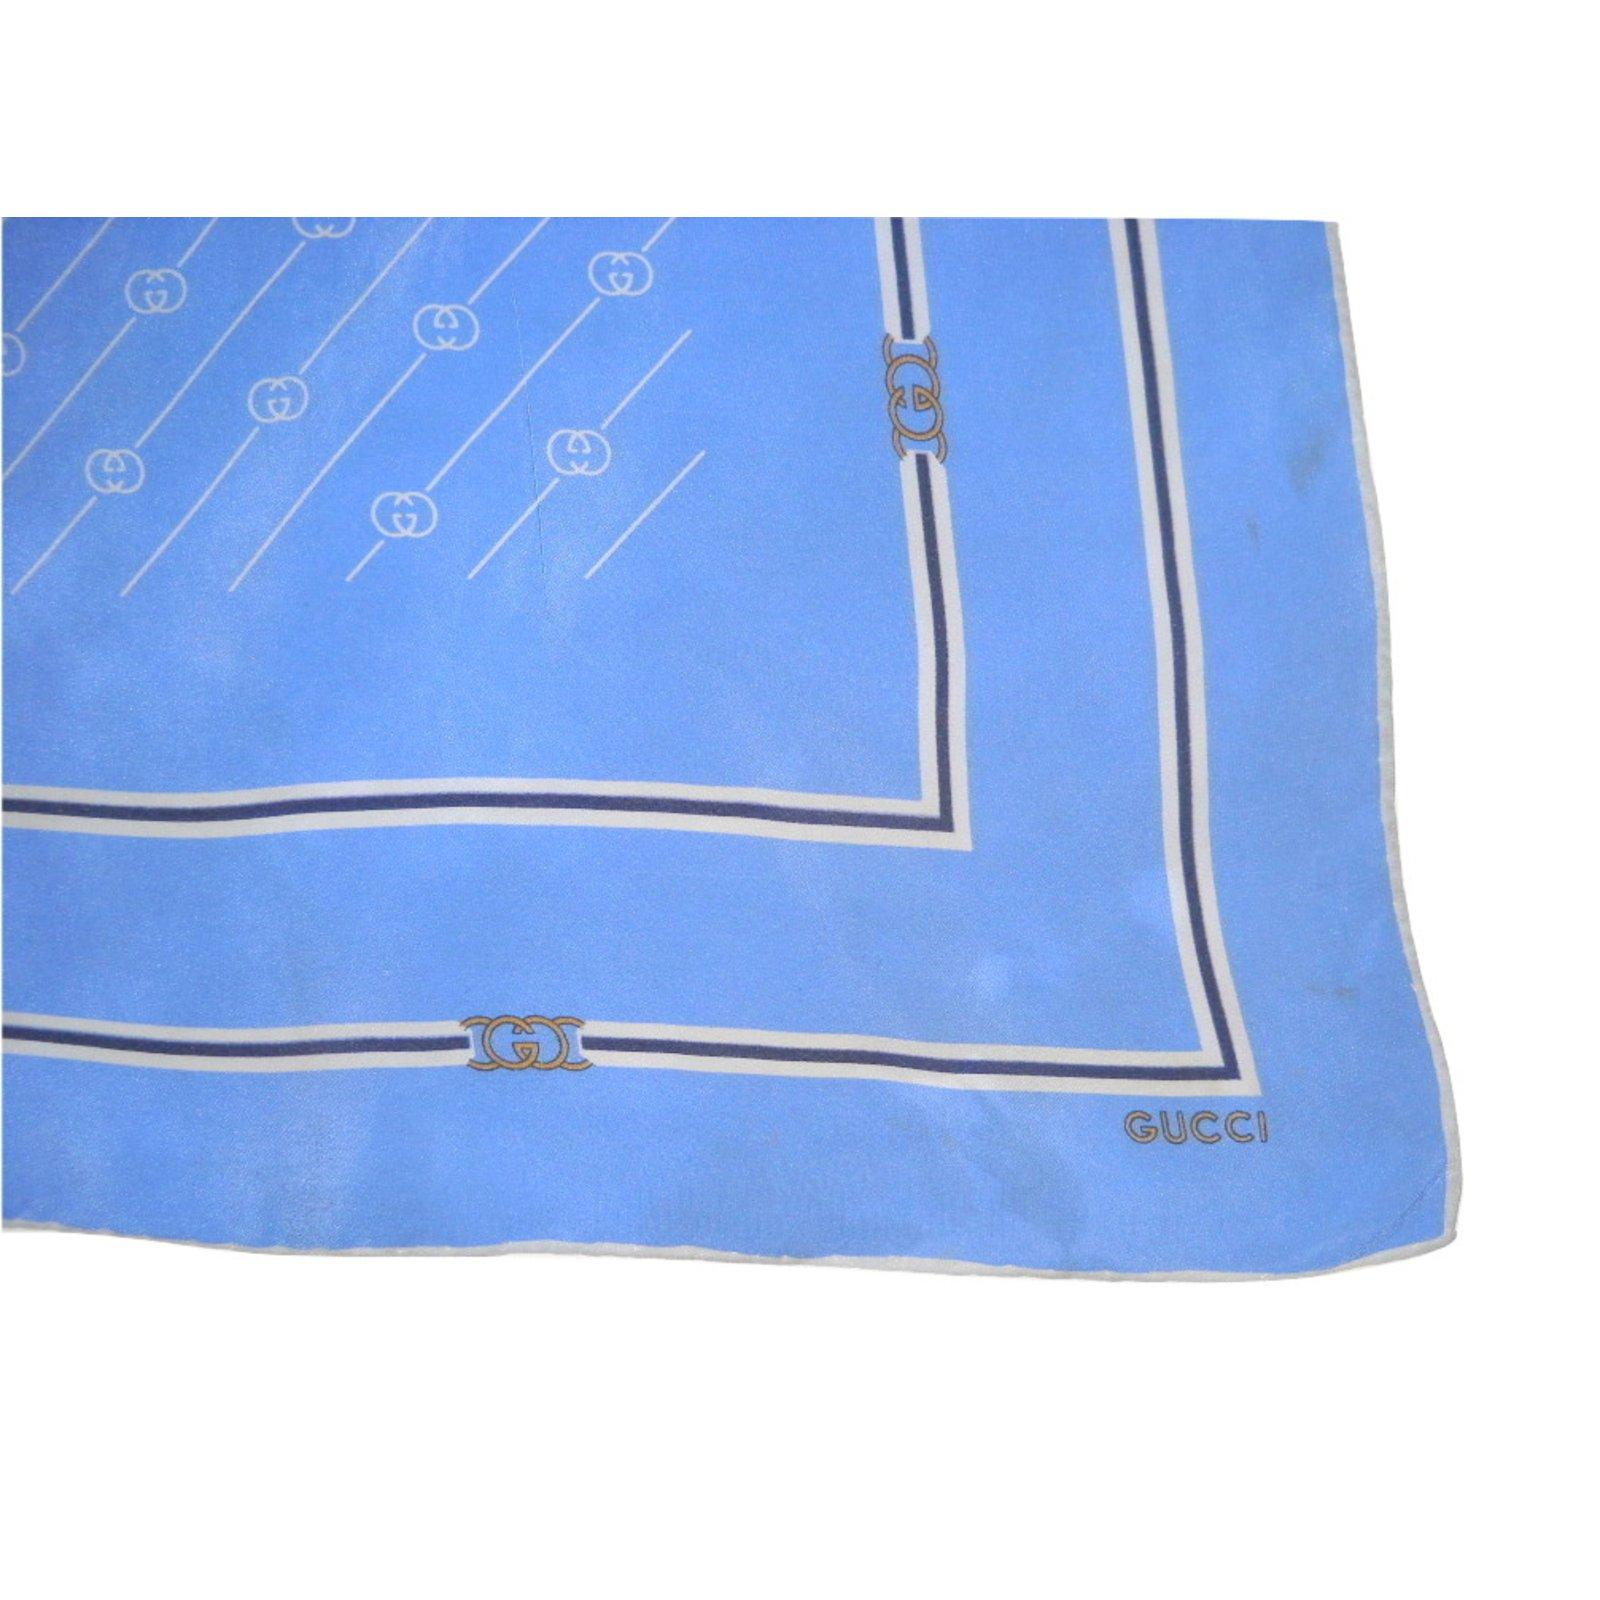 2c55b3137b75 Foulards Gucci Vintage foulard soie Soie Blanc,Bleu,Gris ref.28809 - Joli  Closet